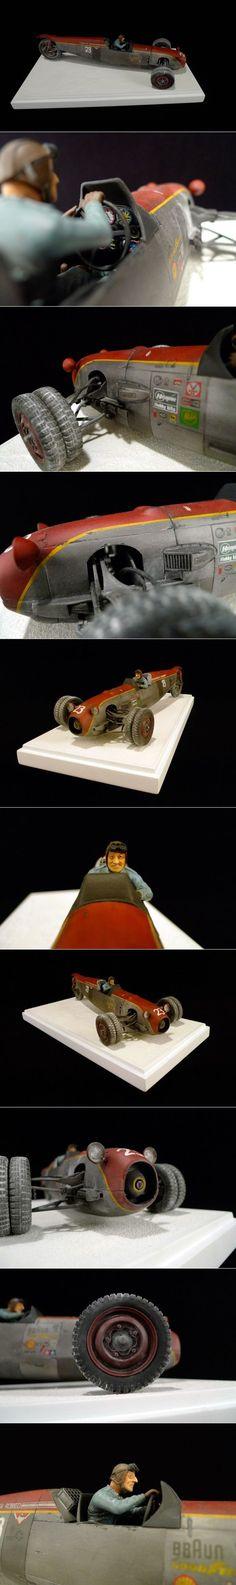 Salt Flat Racer